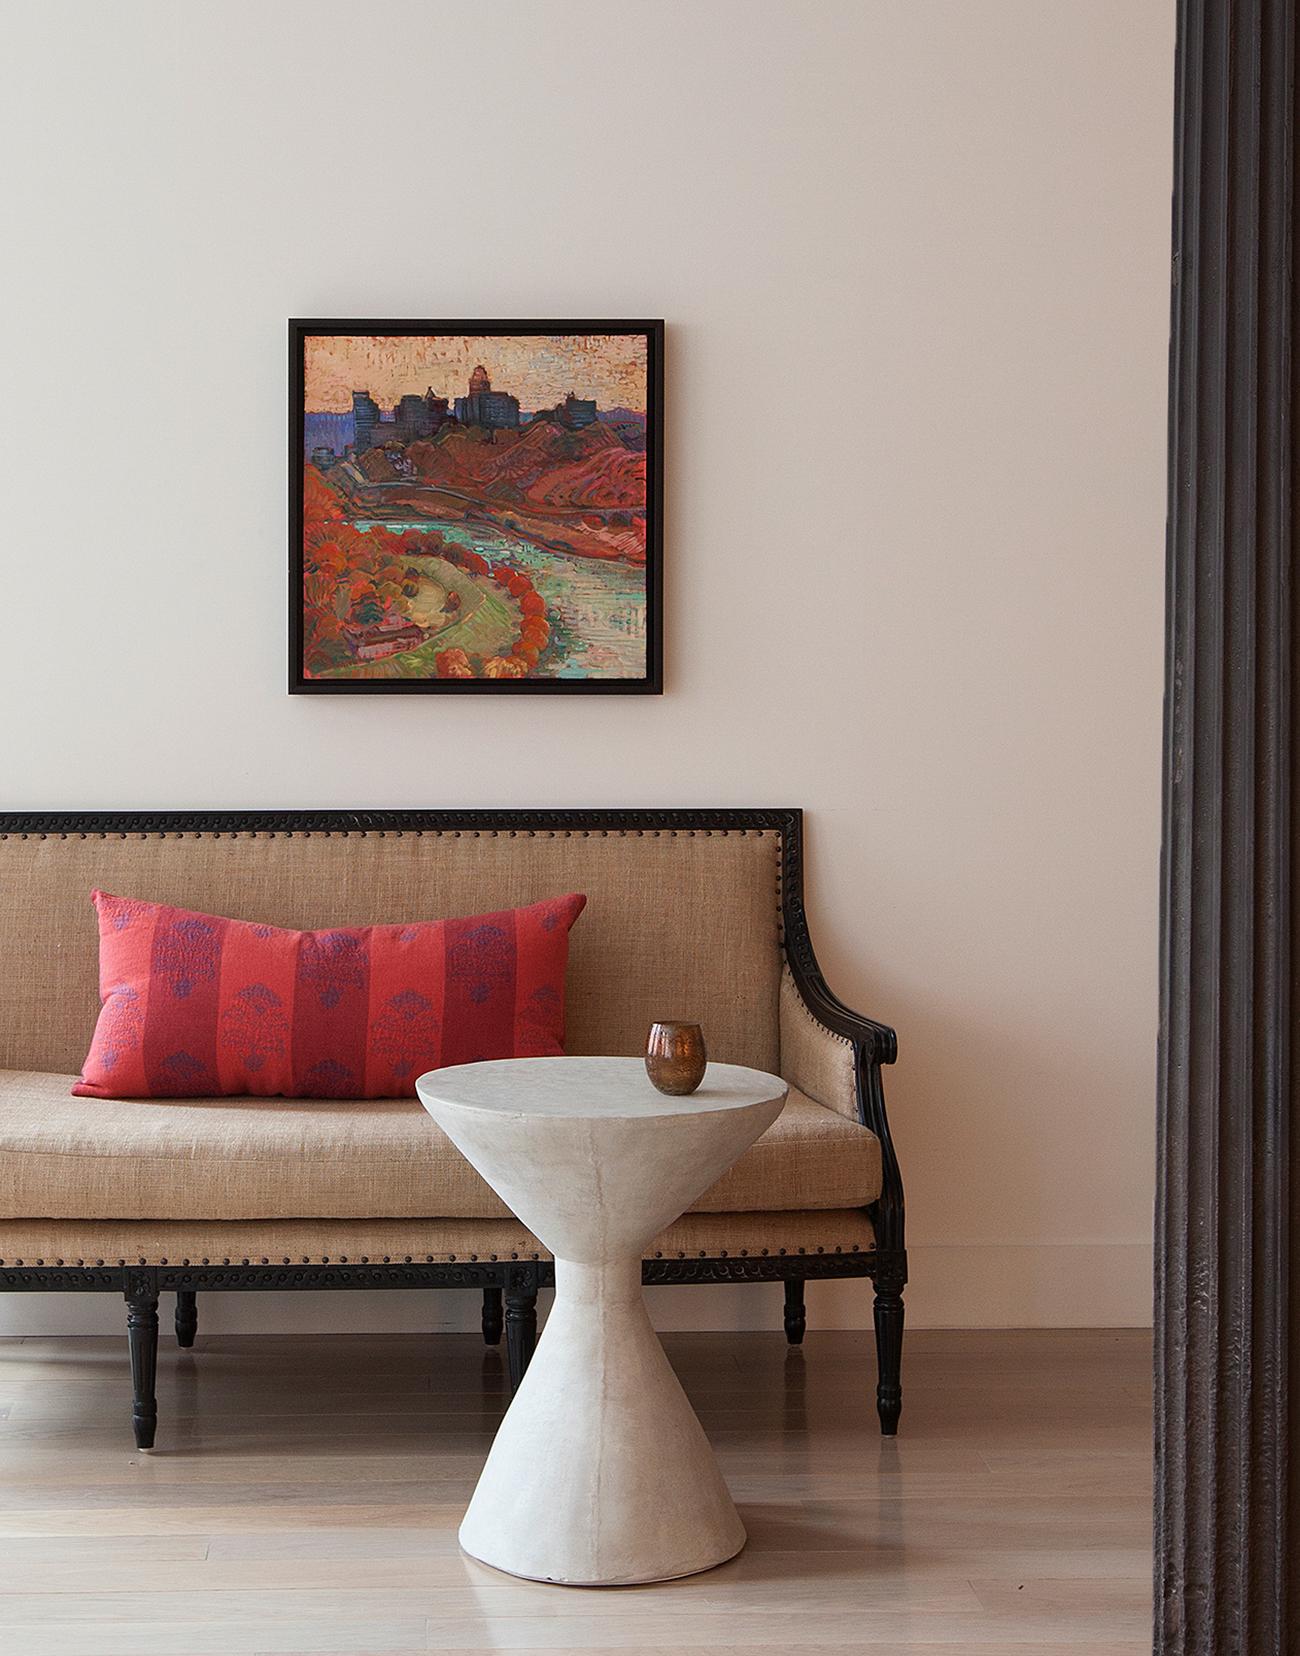 Interior design by Liliane Hart Interiors